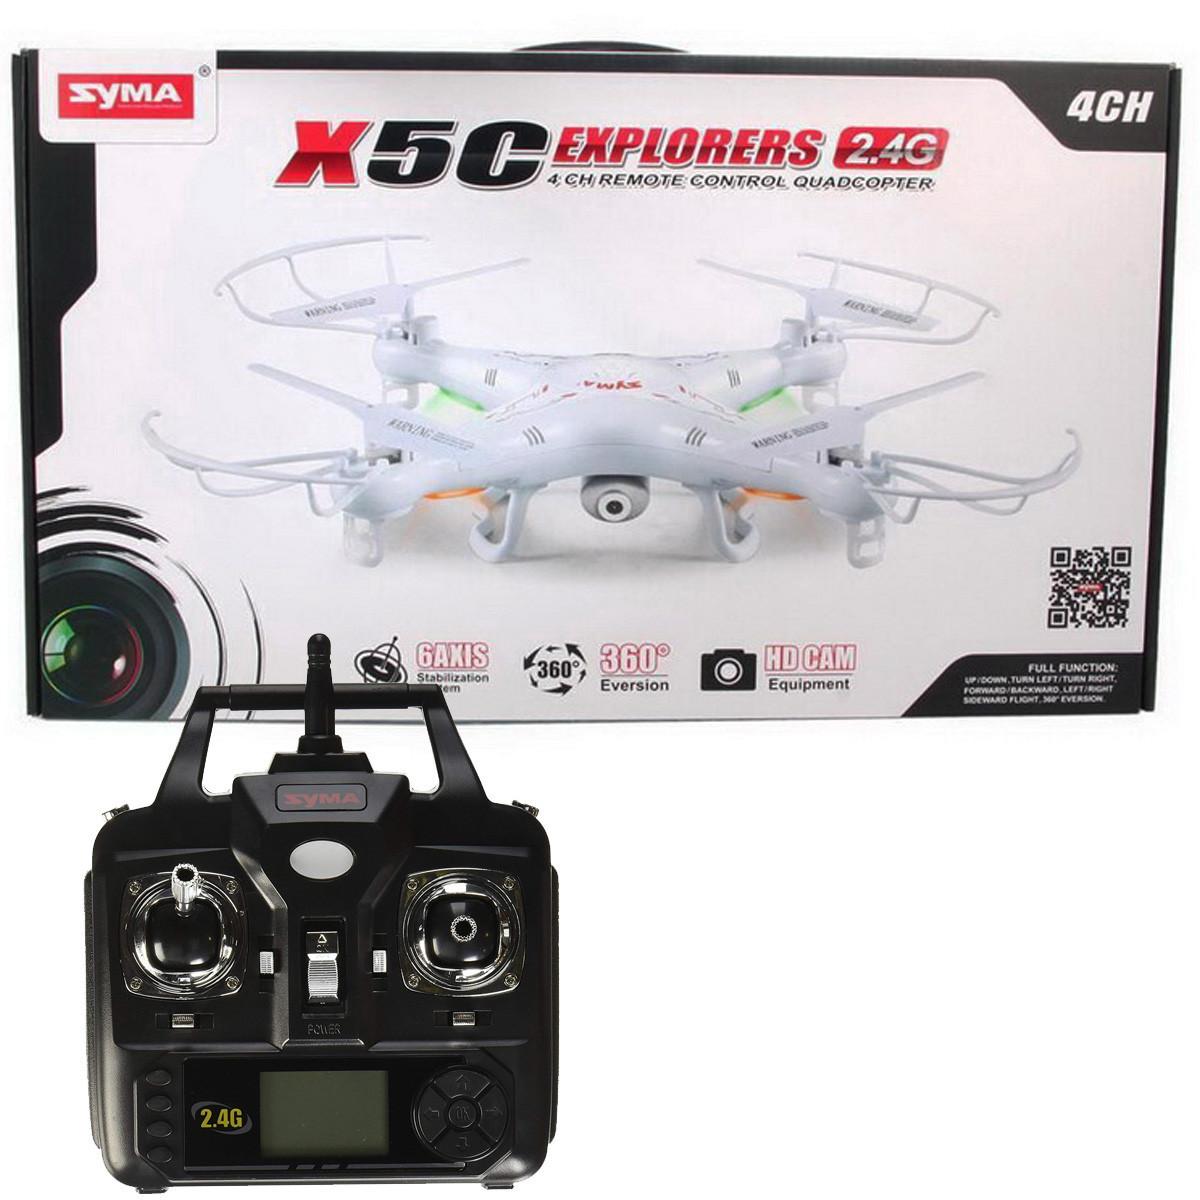 Квадрокоптер Syma X5C Explorers р/у c HD камерой Дрон оригинал Сима